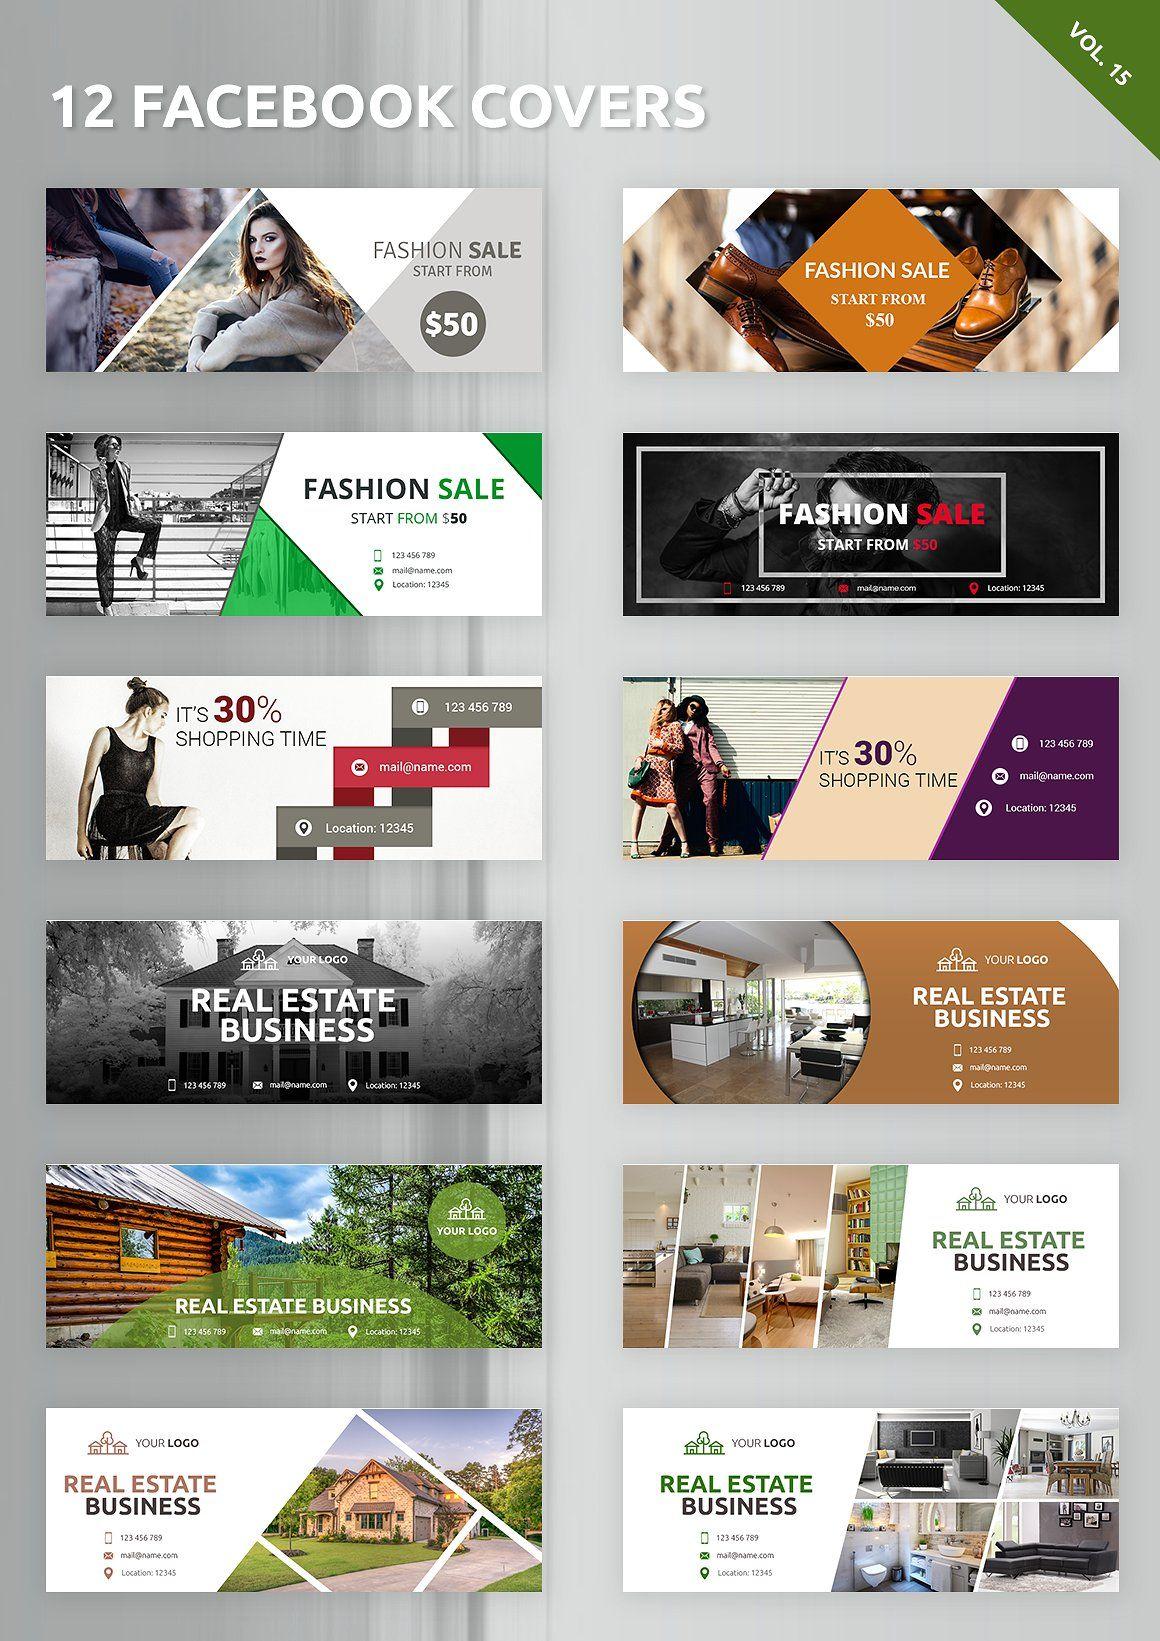 Facebook Covers 12 Templates Facebook Cover Design Facebook Ads Design Banner Design Inspiration